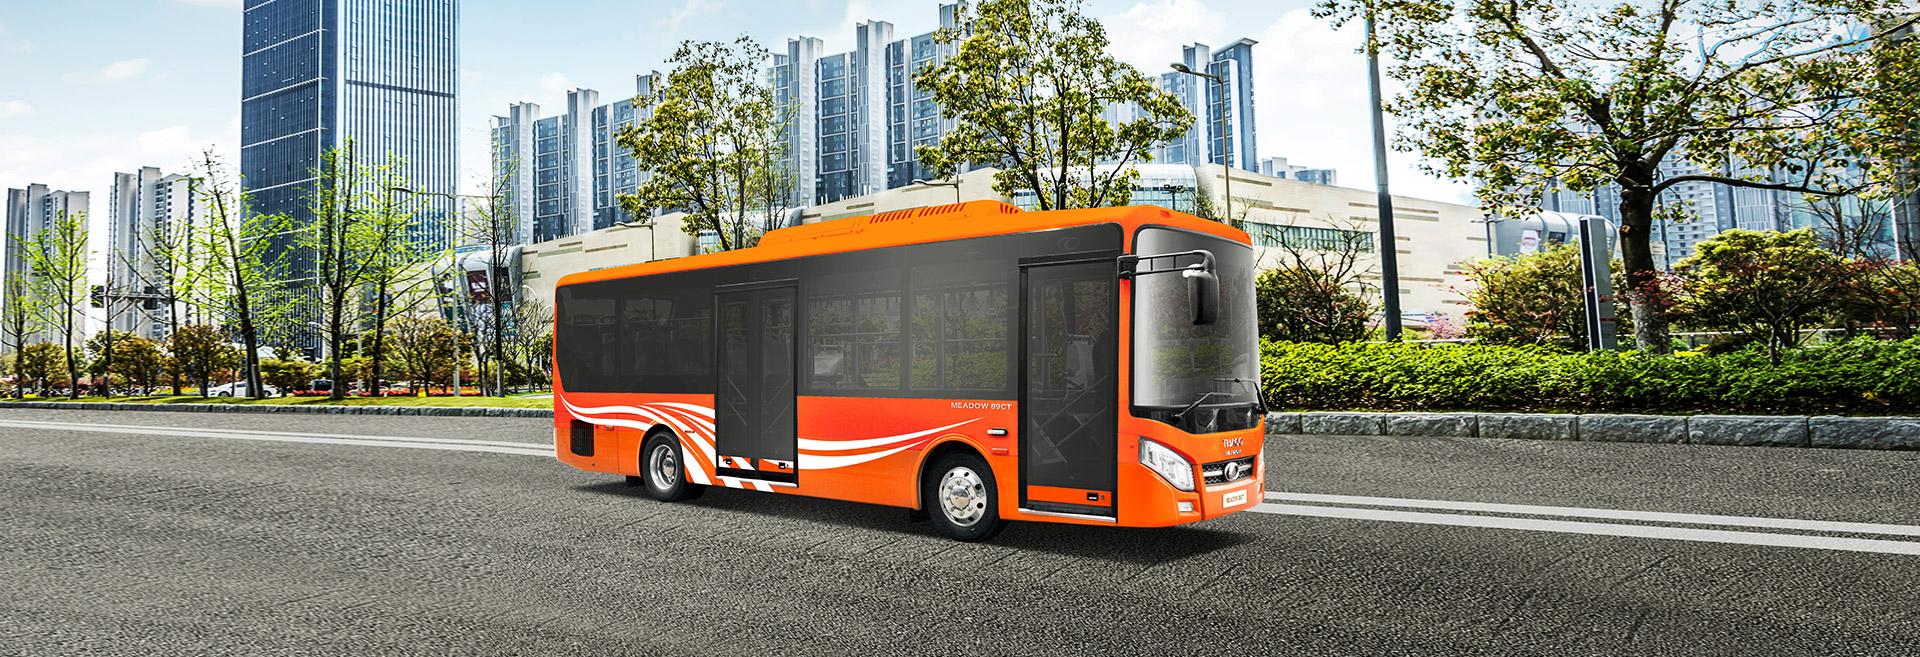 banner_1920x657_citybus_89CT_2